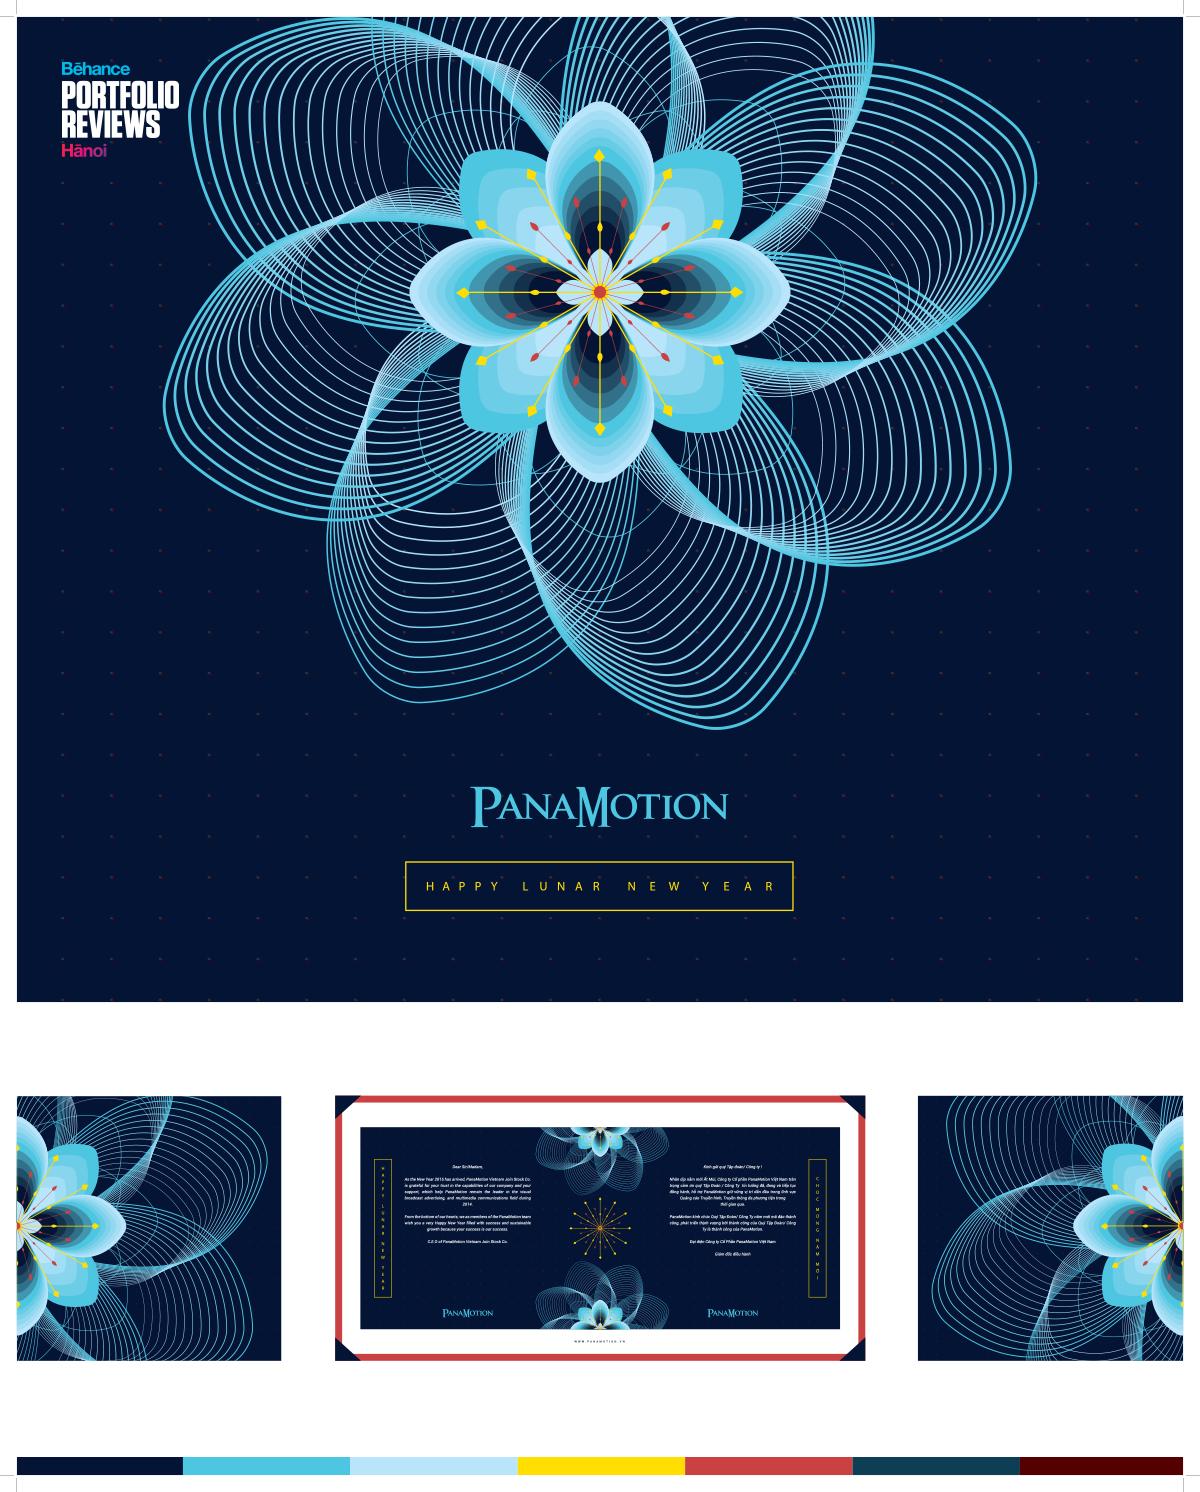 Graphic Design - Sơn Nguyễn